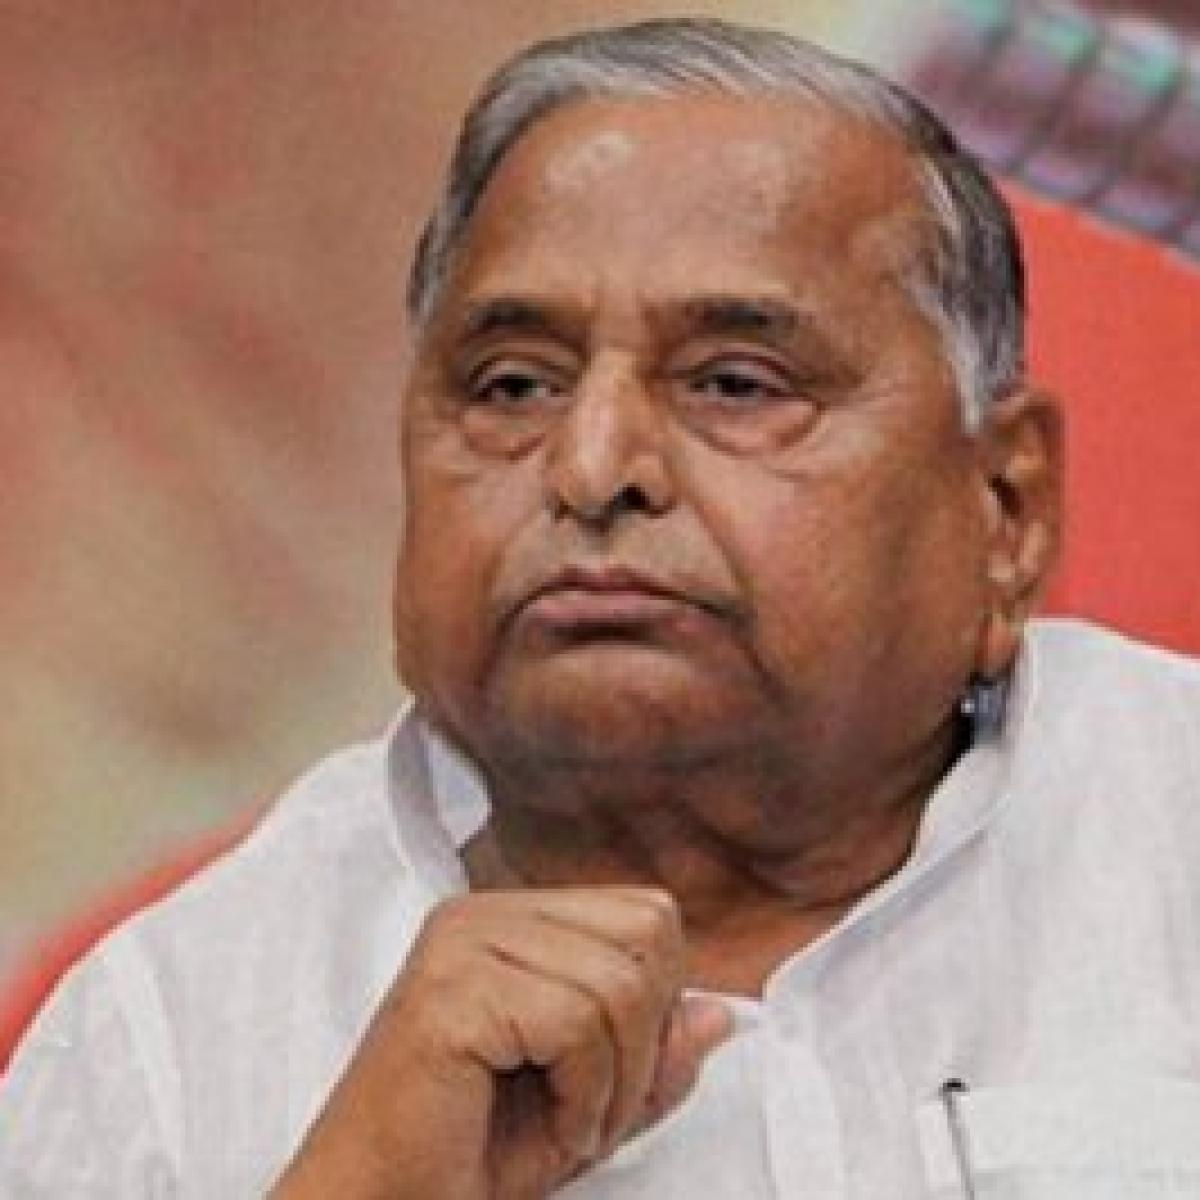 Samajwadi Party patriarch Mulayam Singh Yadav hospitalised again in Lucknow